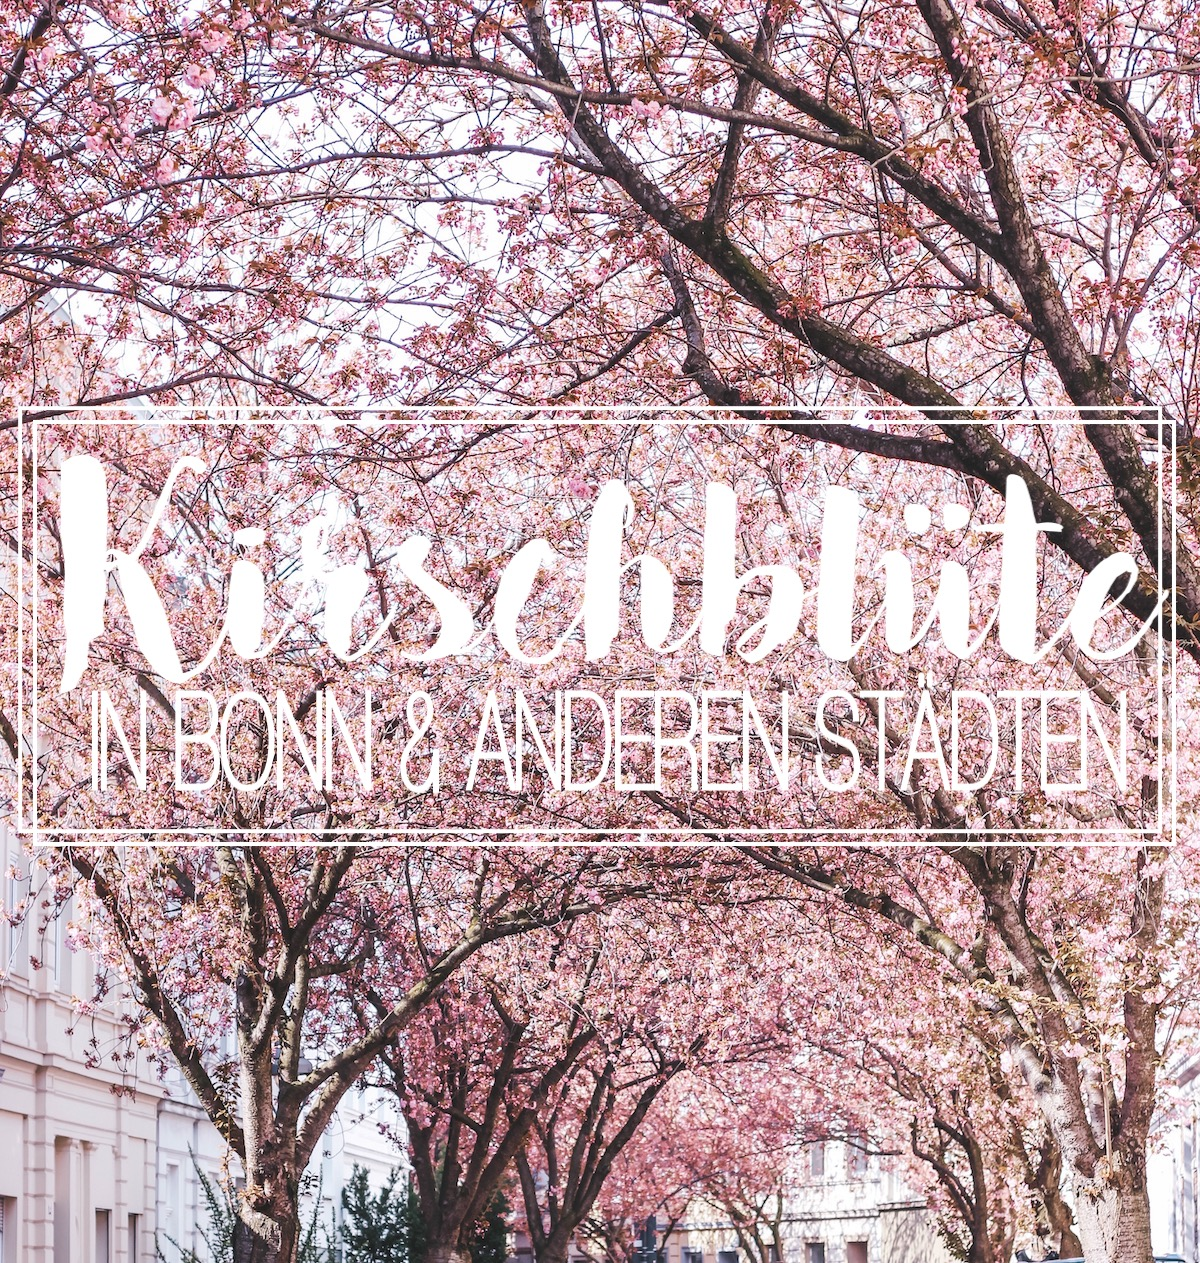 Fashionblog Stuttgart Kirschblüte Kirschblüten Bonn Outfit Beste Orte Kirschblüte Deutschland TheBlondeLion